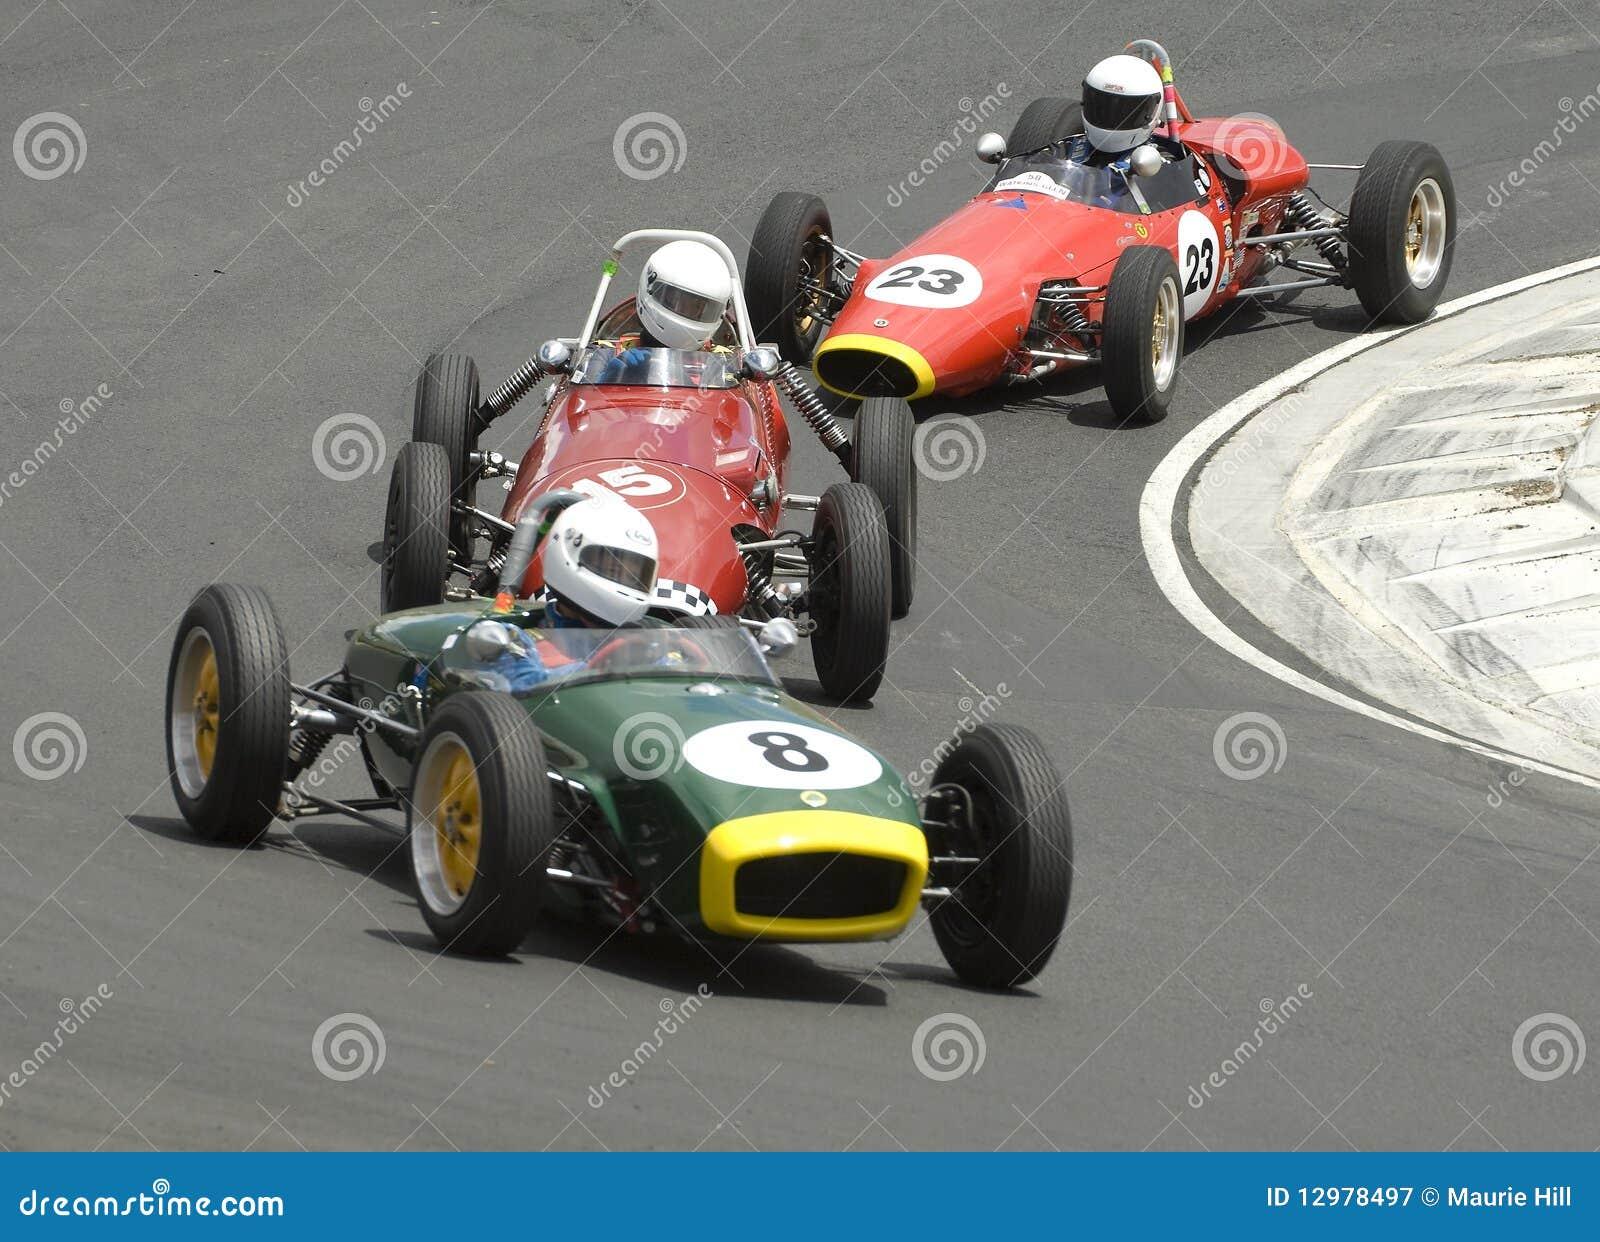 1962 Lotus 22 Formula Junior Car Editorial Stock Photo - Image of ...